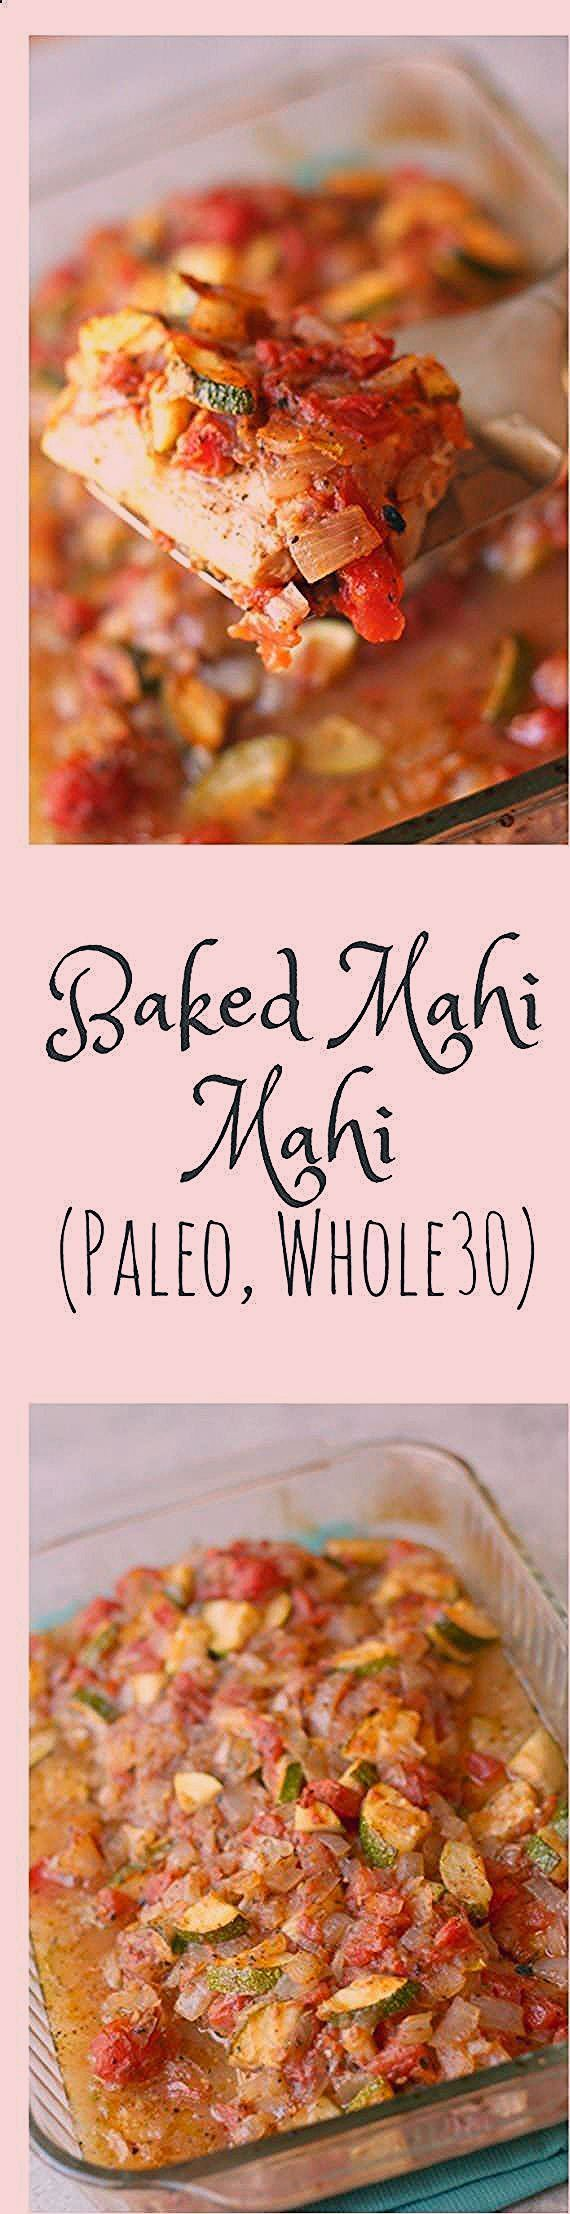 Photo of Baked Mahi Mahi with Vegetables (Paleo, Whole30) snaper fish recipes;tapia fish …